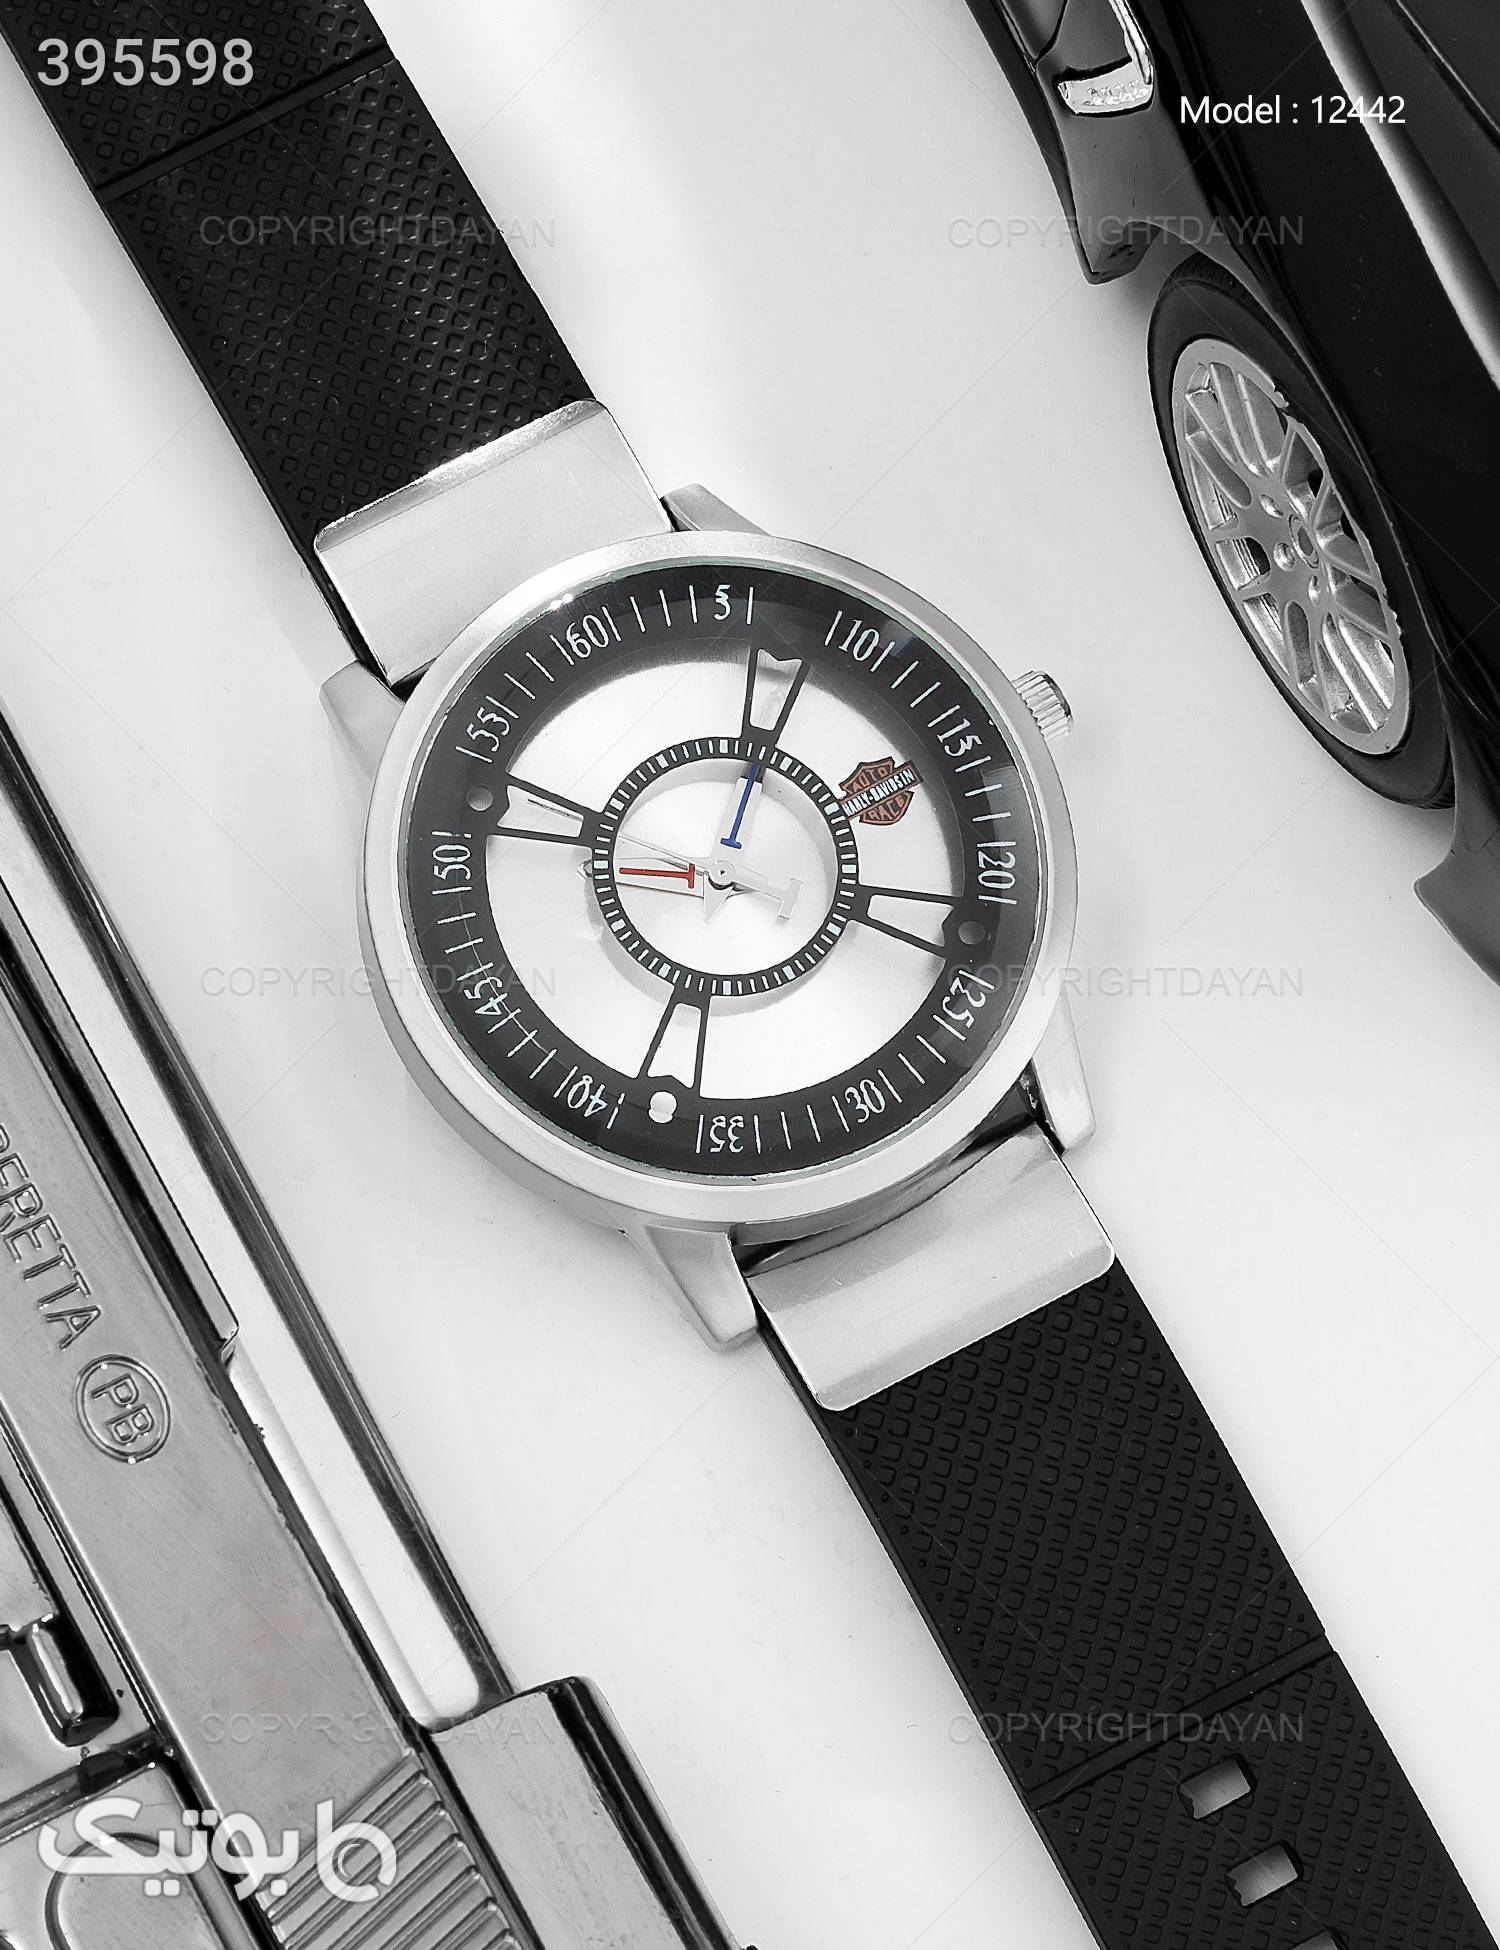 ساعت مچی مردانه Araz مدل 12442 مشکی ساعت